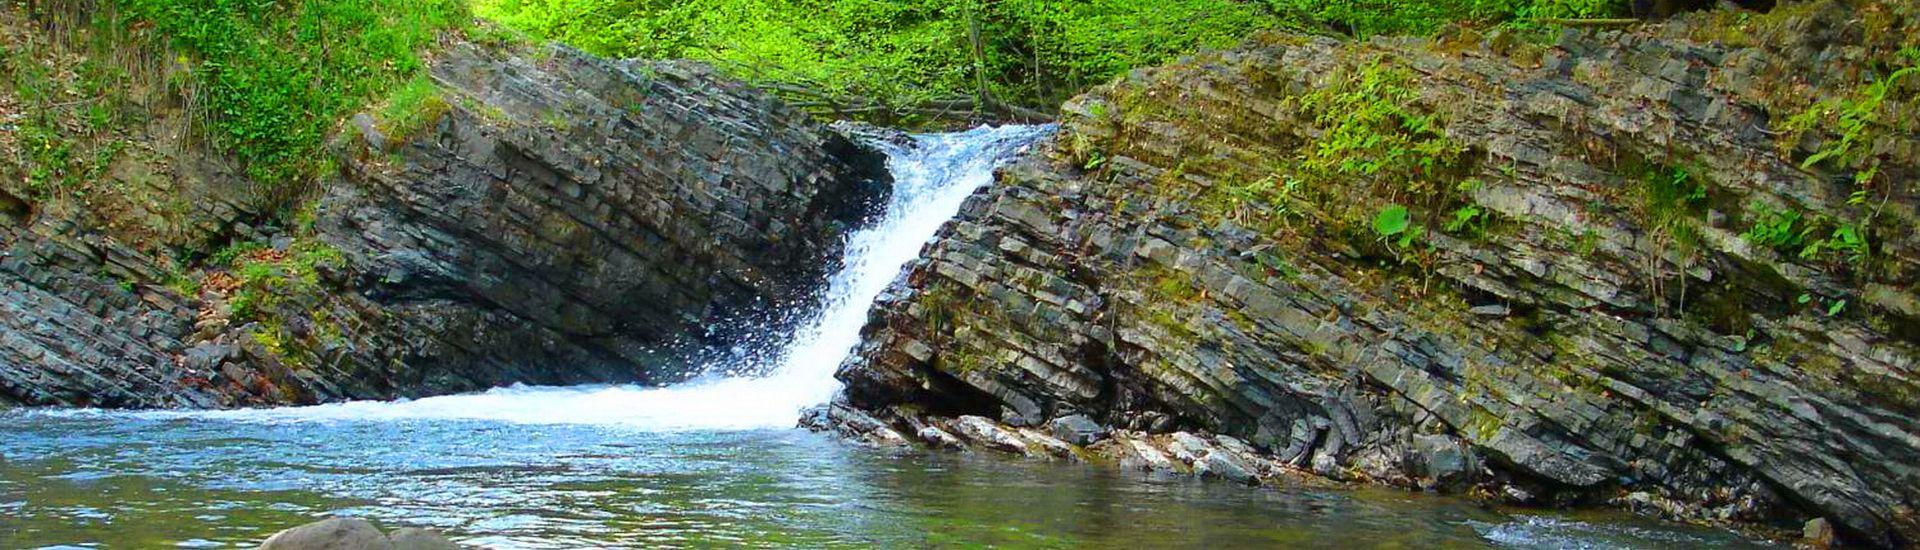 Лумшорские водопады в Карпатах